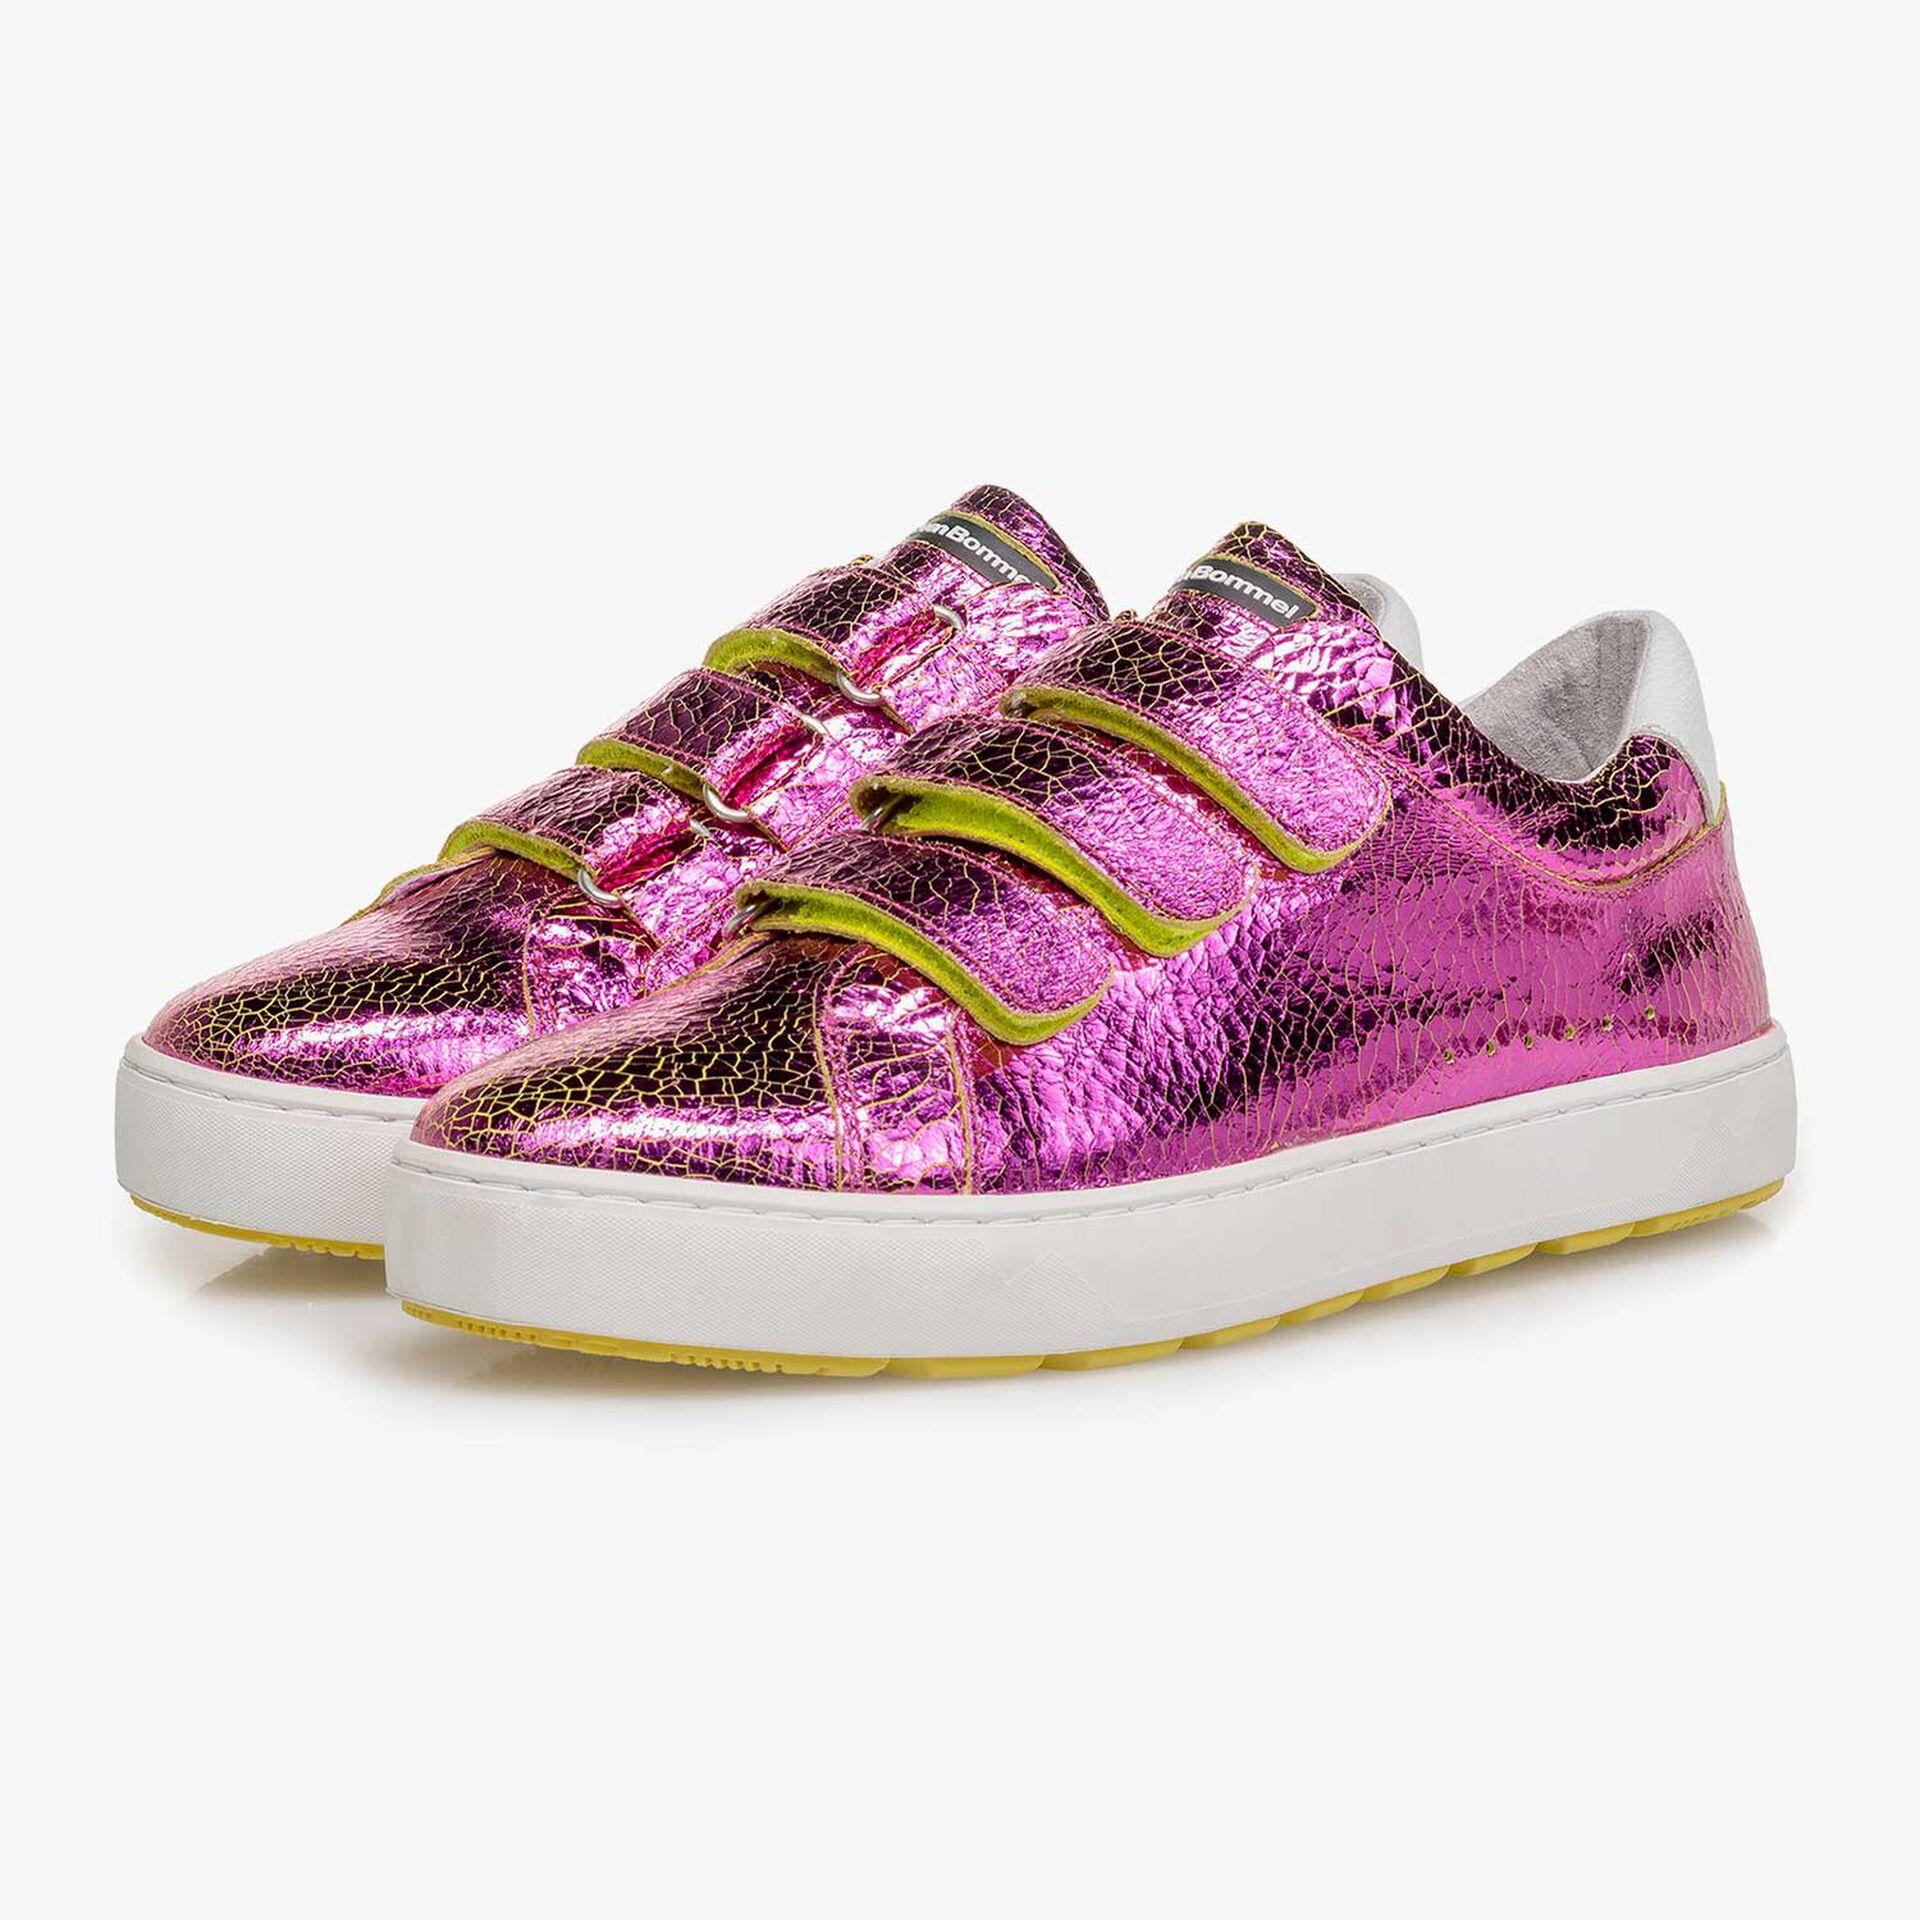 Rosa Metallic Leder-Sneaker mit Craquelé-Effekt